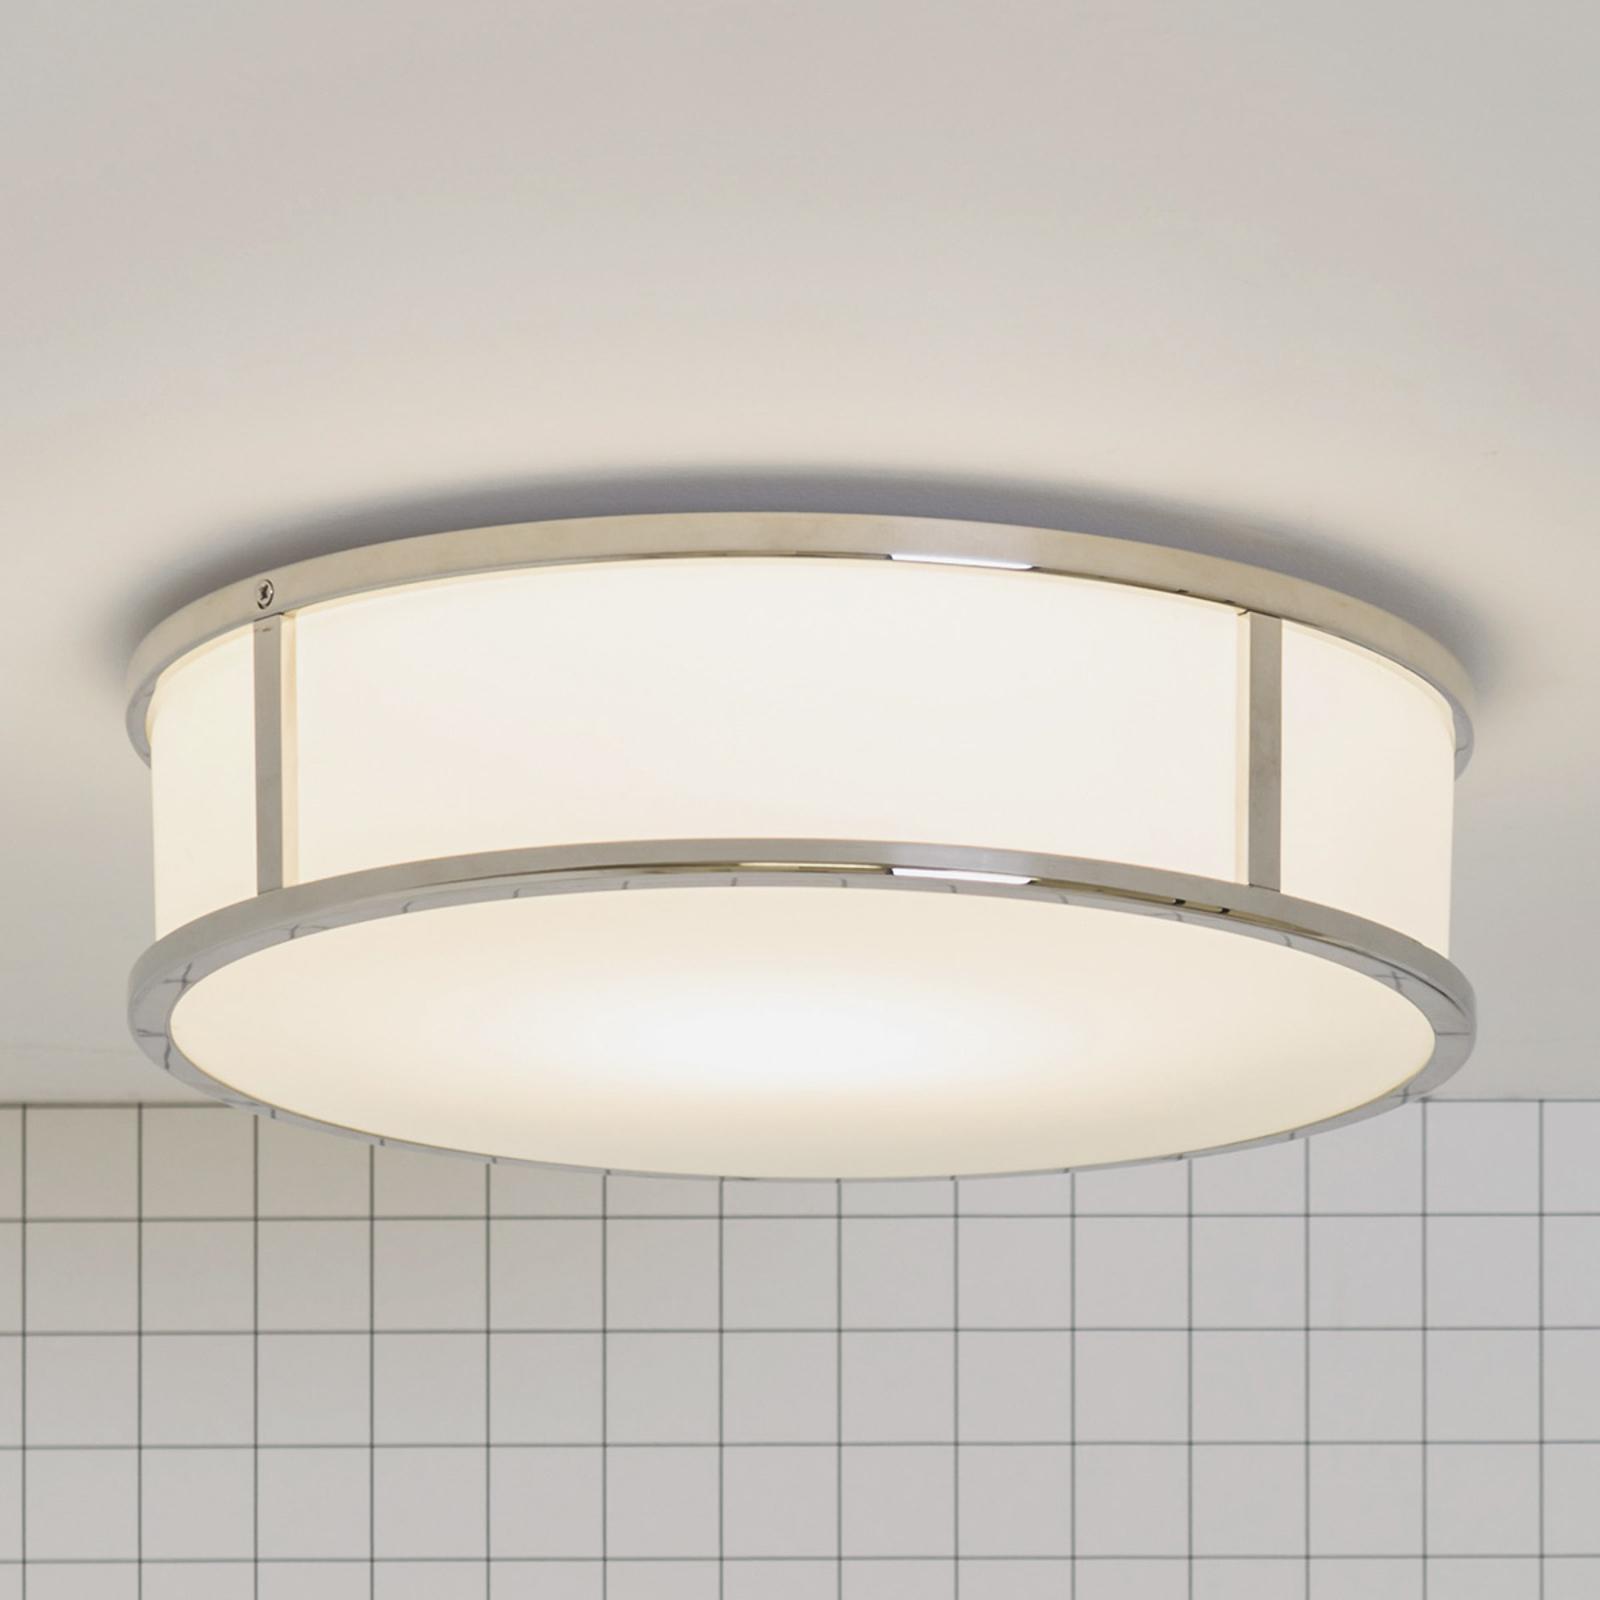 Astro Mashiko Round lámpara de techo Ø 30 cm cromo